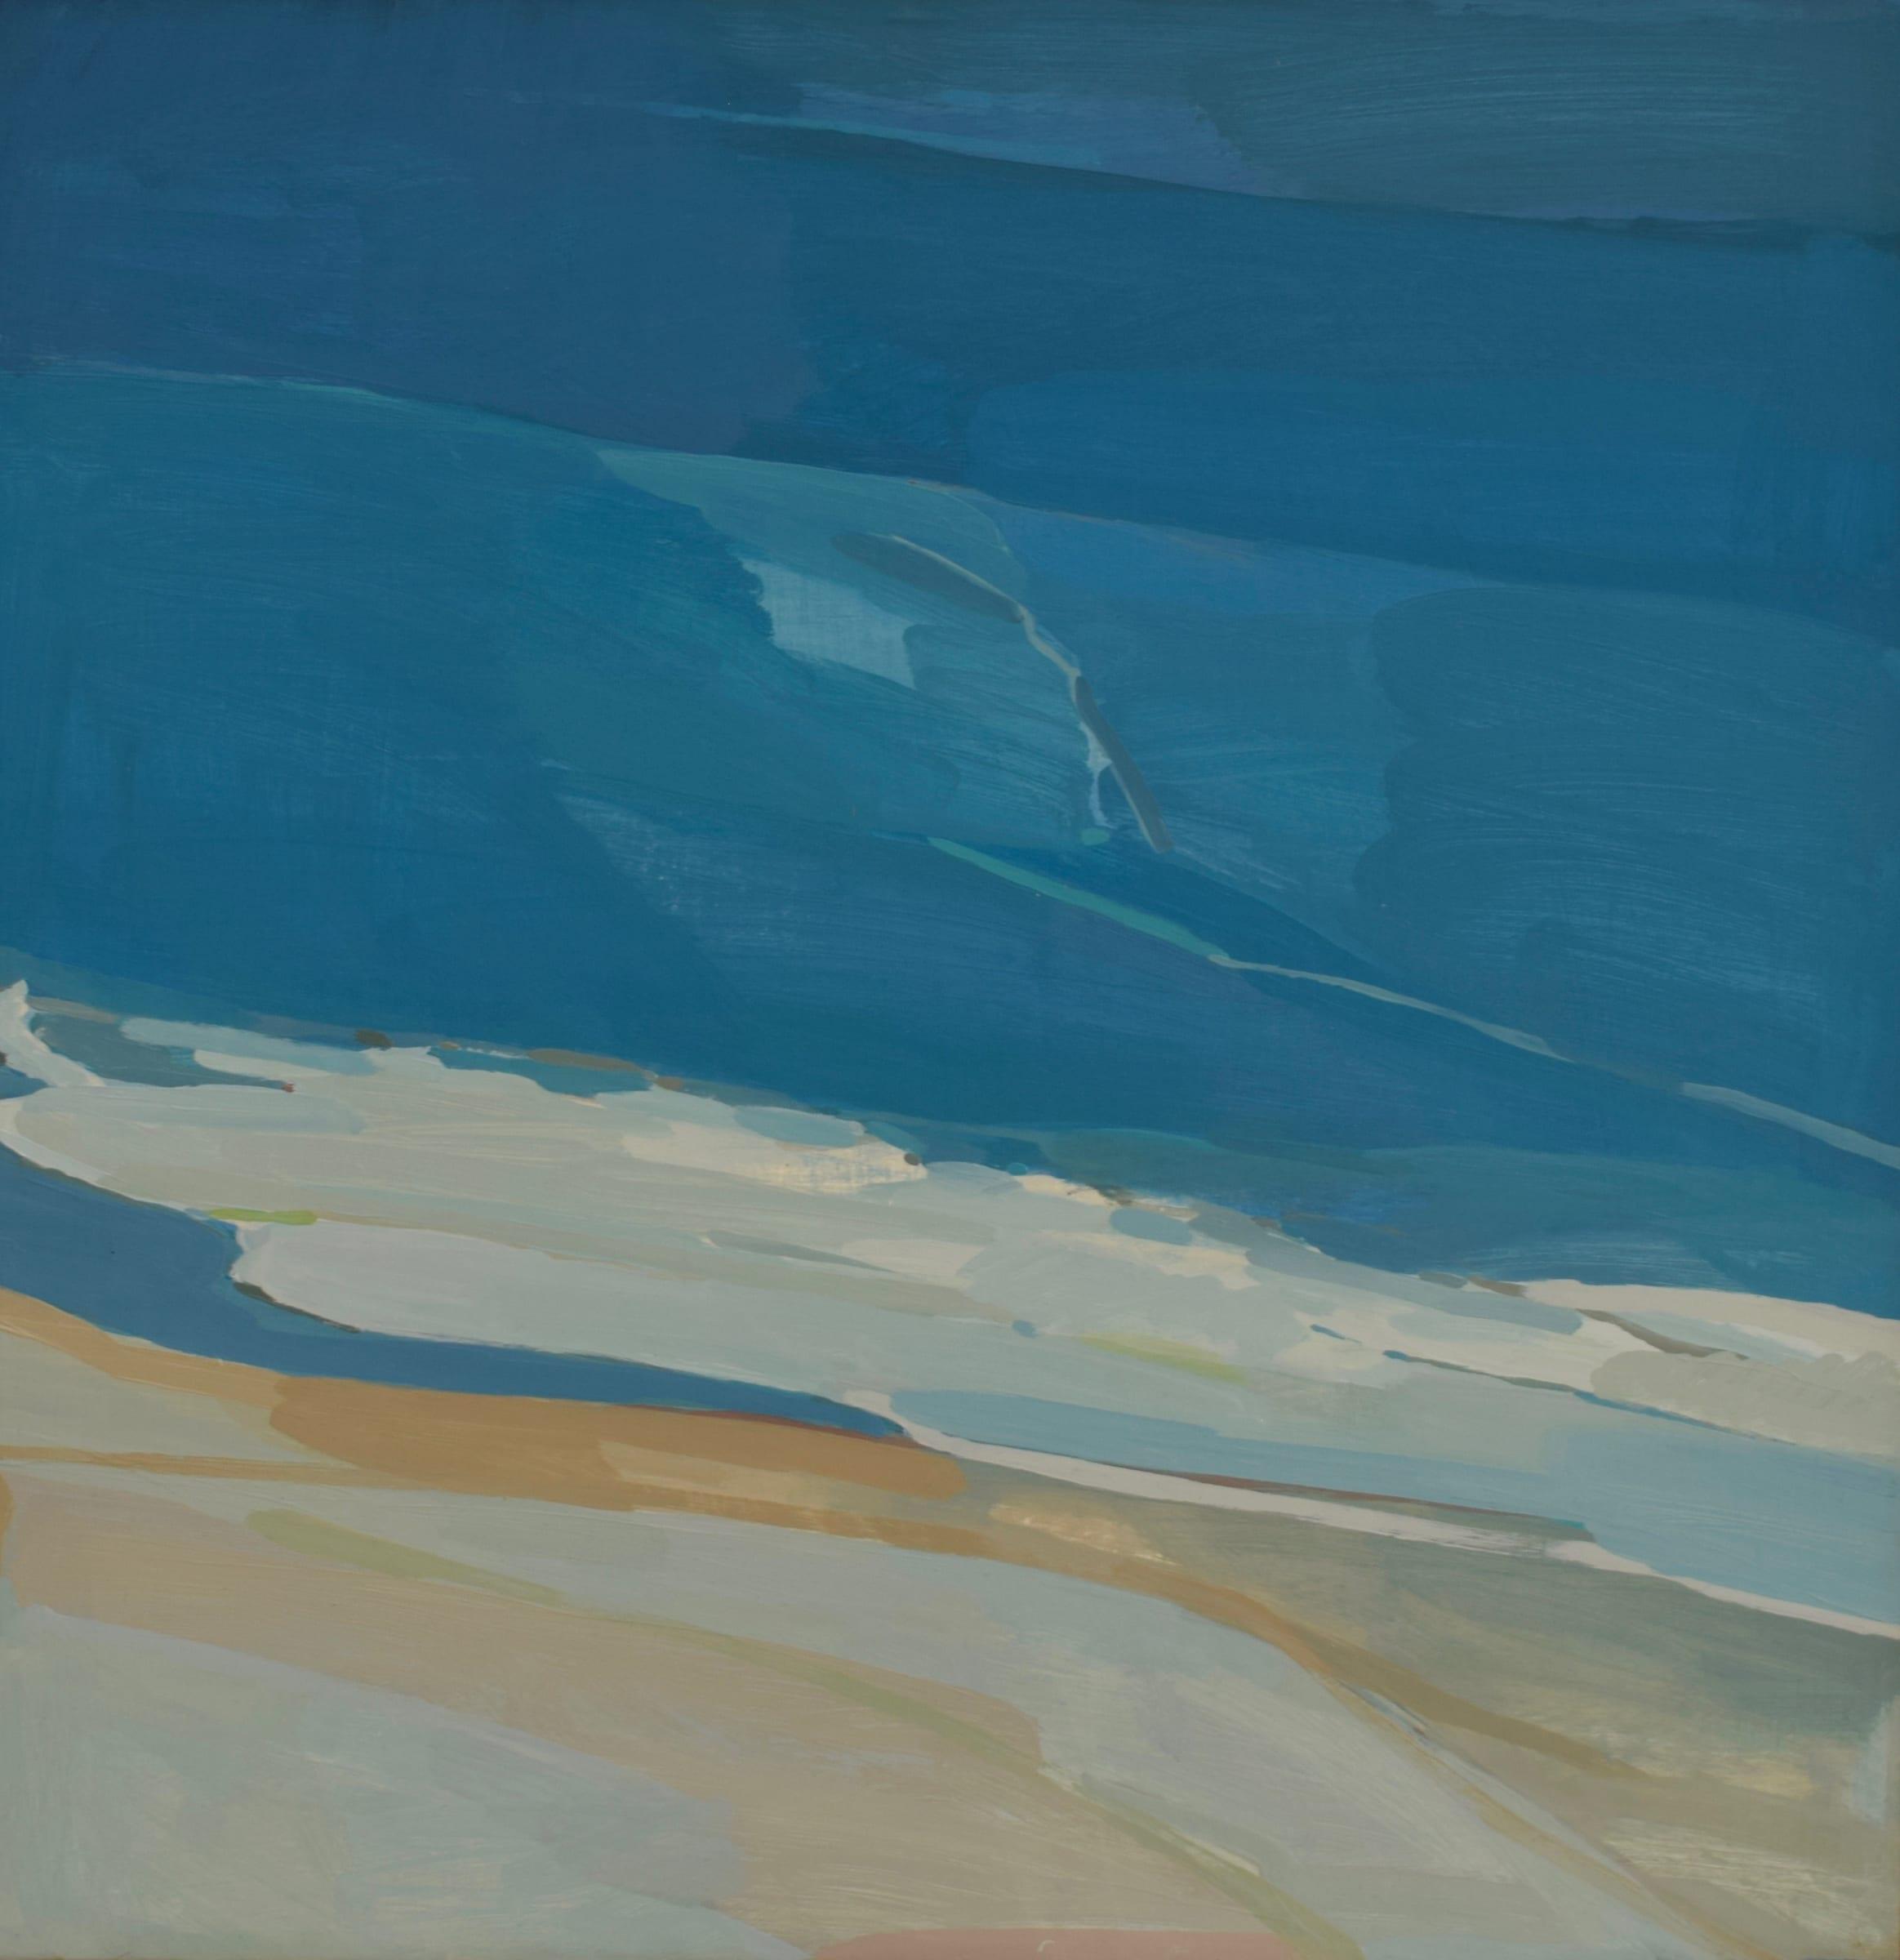 "<span class=""link fancybox-details-link""><a href=""/artists/40-karen-smidth/works/538-karen-smidth-blue/"">View Detail Page</a></span><div class=""artist""><strong>Karen Smidth</strong></div> <div class=""title""><em>Blue </em></div> <div class=""medium"">Oil on True Gesso </div> <div class=""dimensions"">20 x 20 inches </div>"